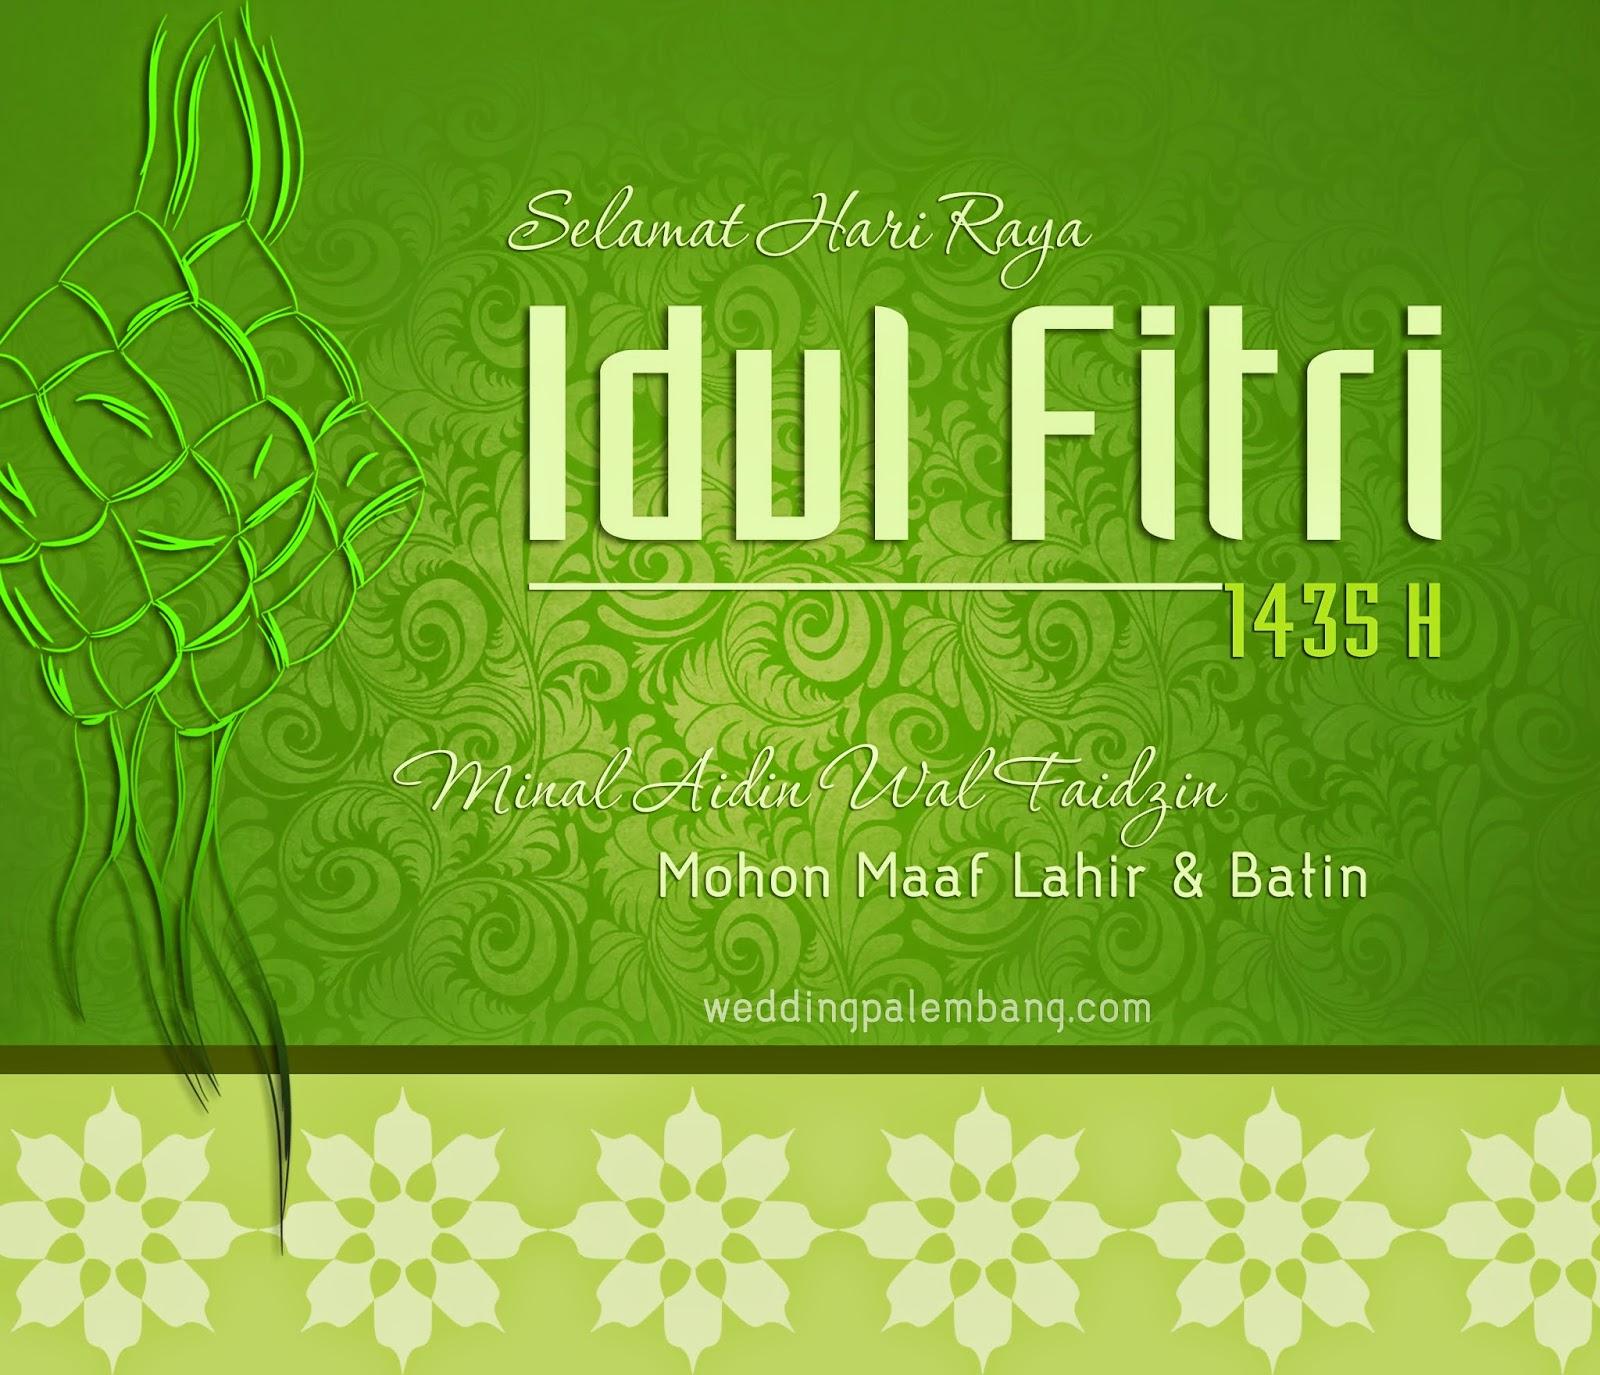 Gambar Terkait Untuk Kartu Ucapan Selamat Hari Raya Idul Fitri Wallpaper Gallery